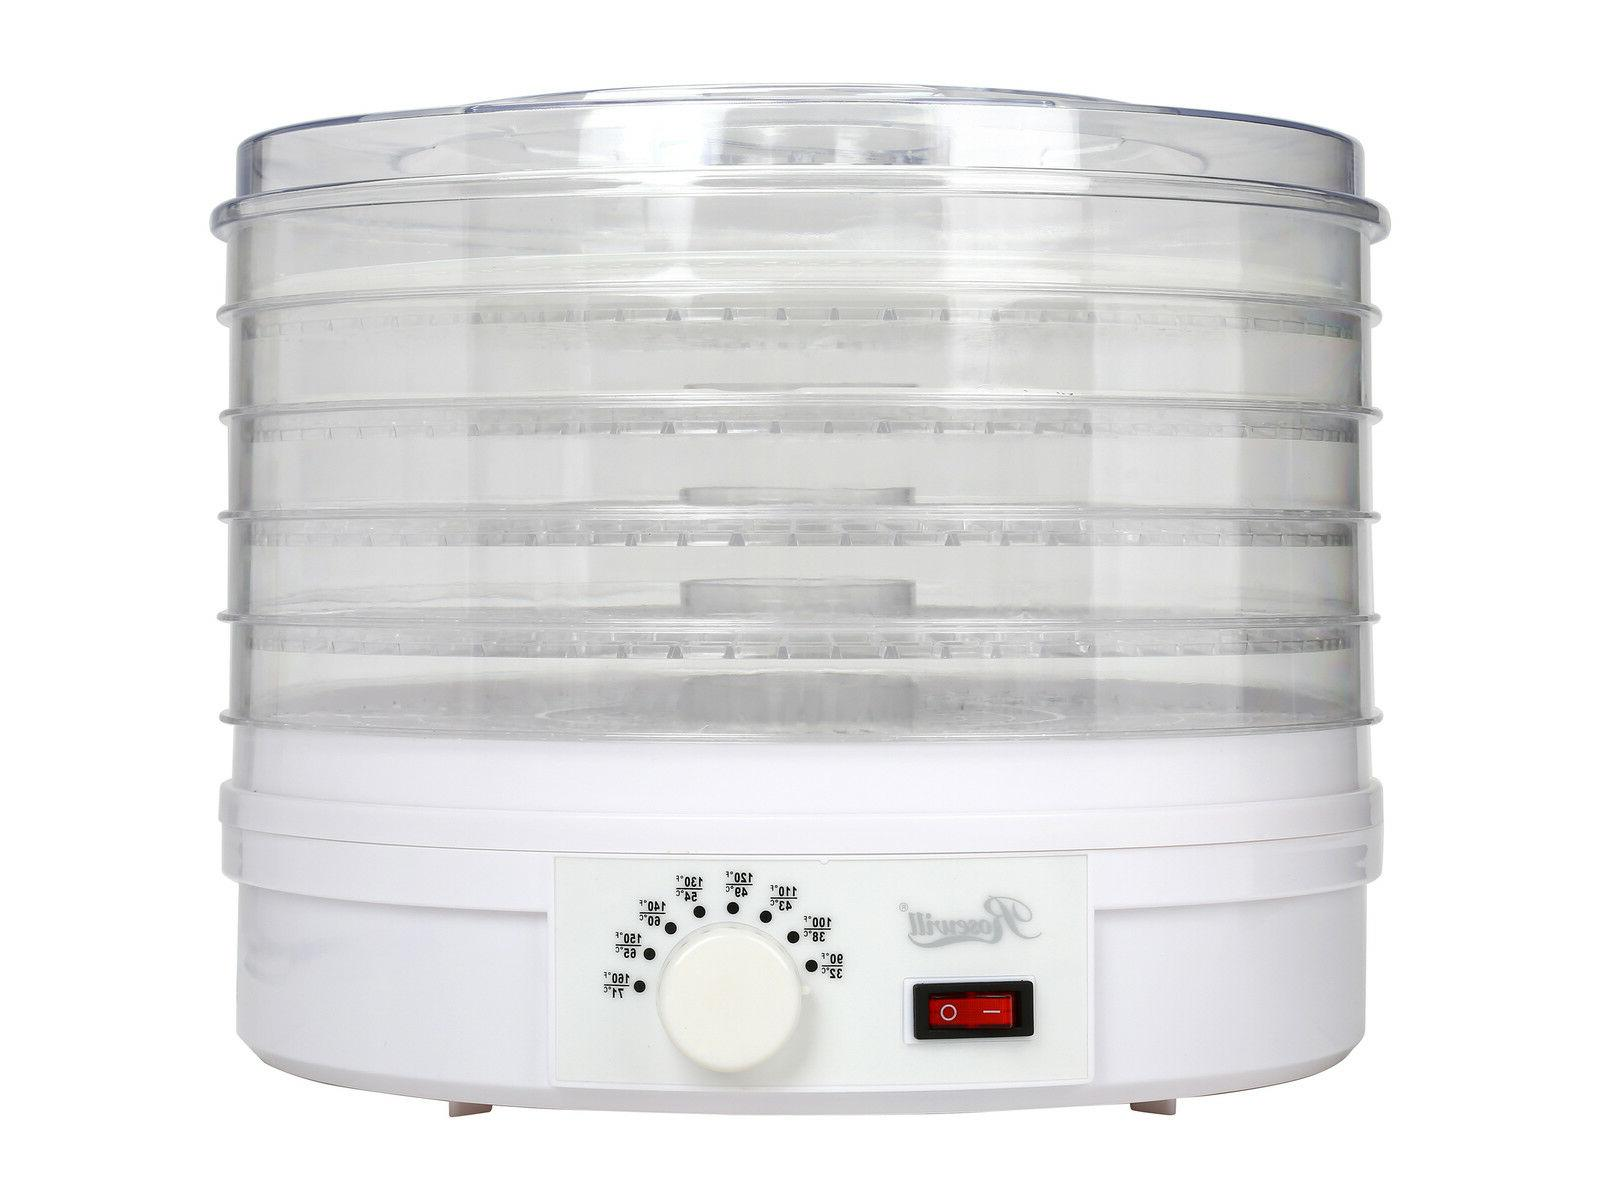 Rosewill Electric Dehydrator